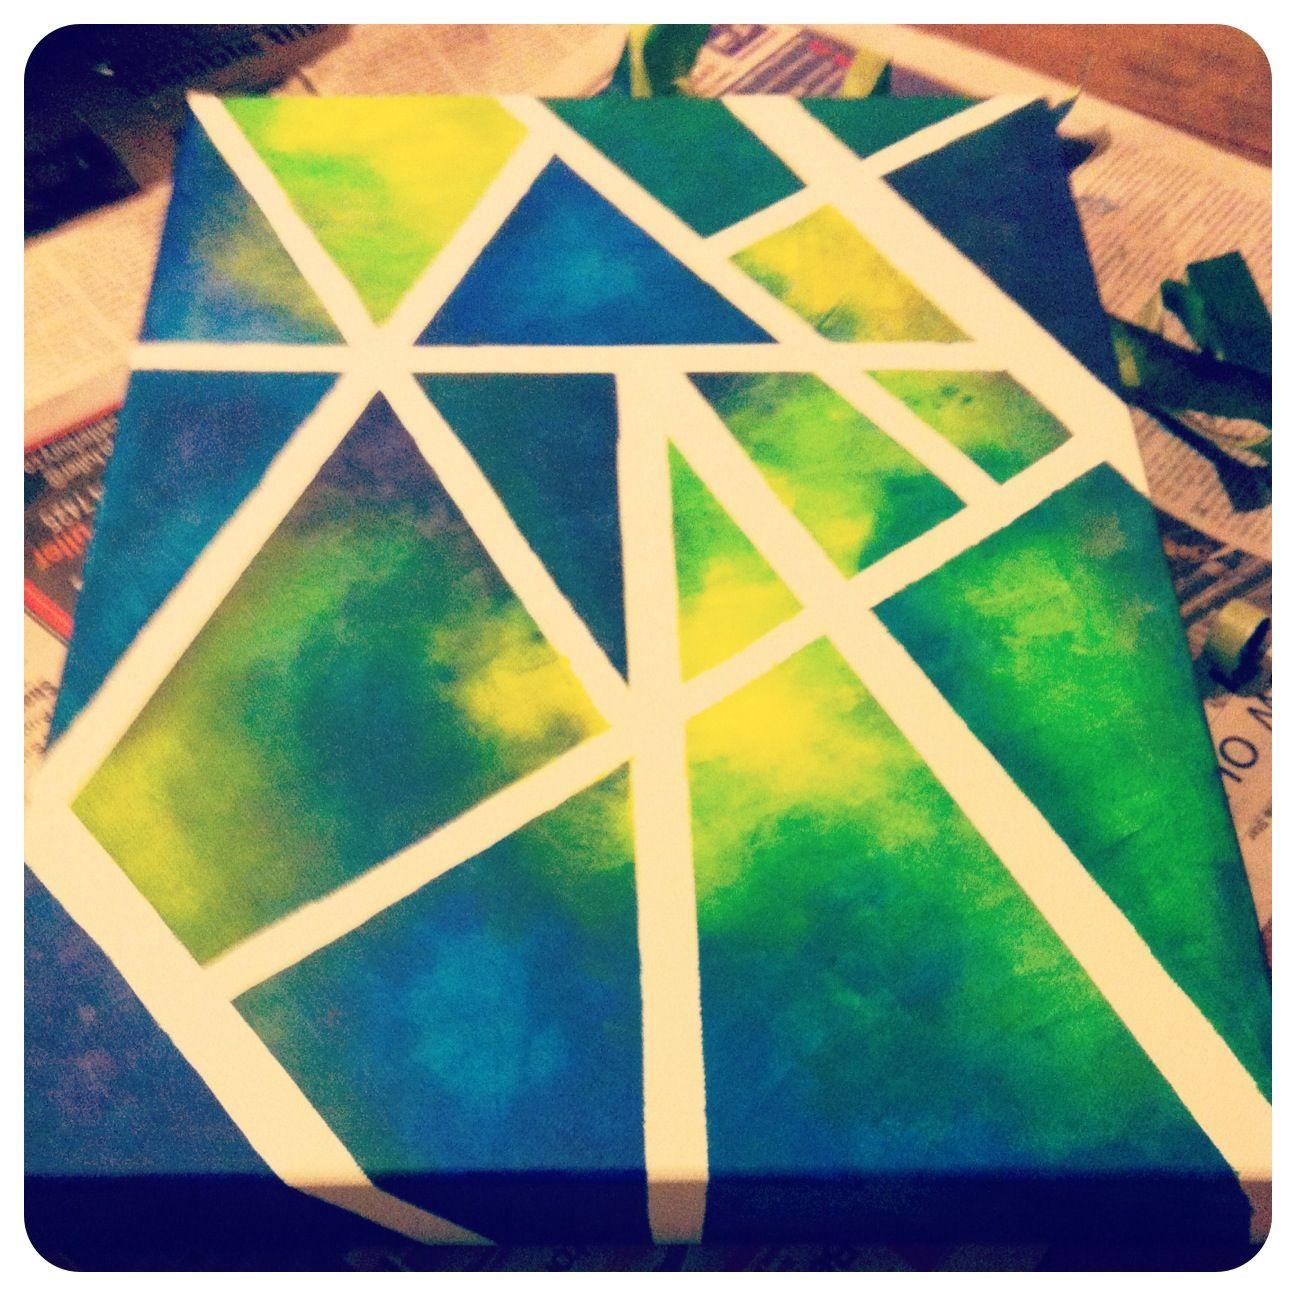 Easy canvas art using sponges and masking tape | Diy art ...